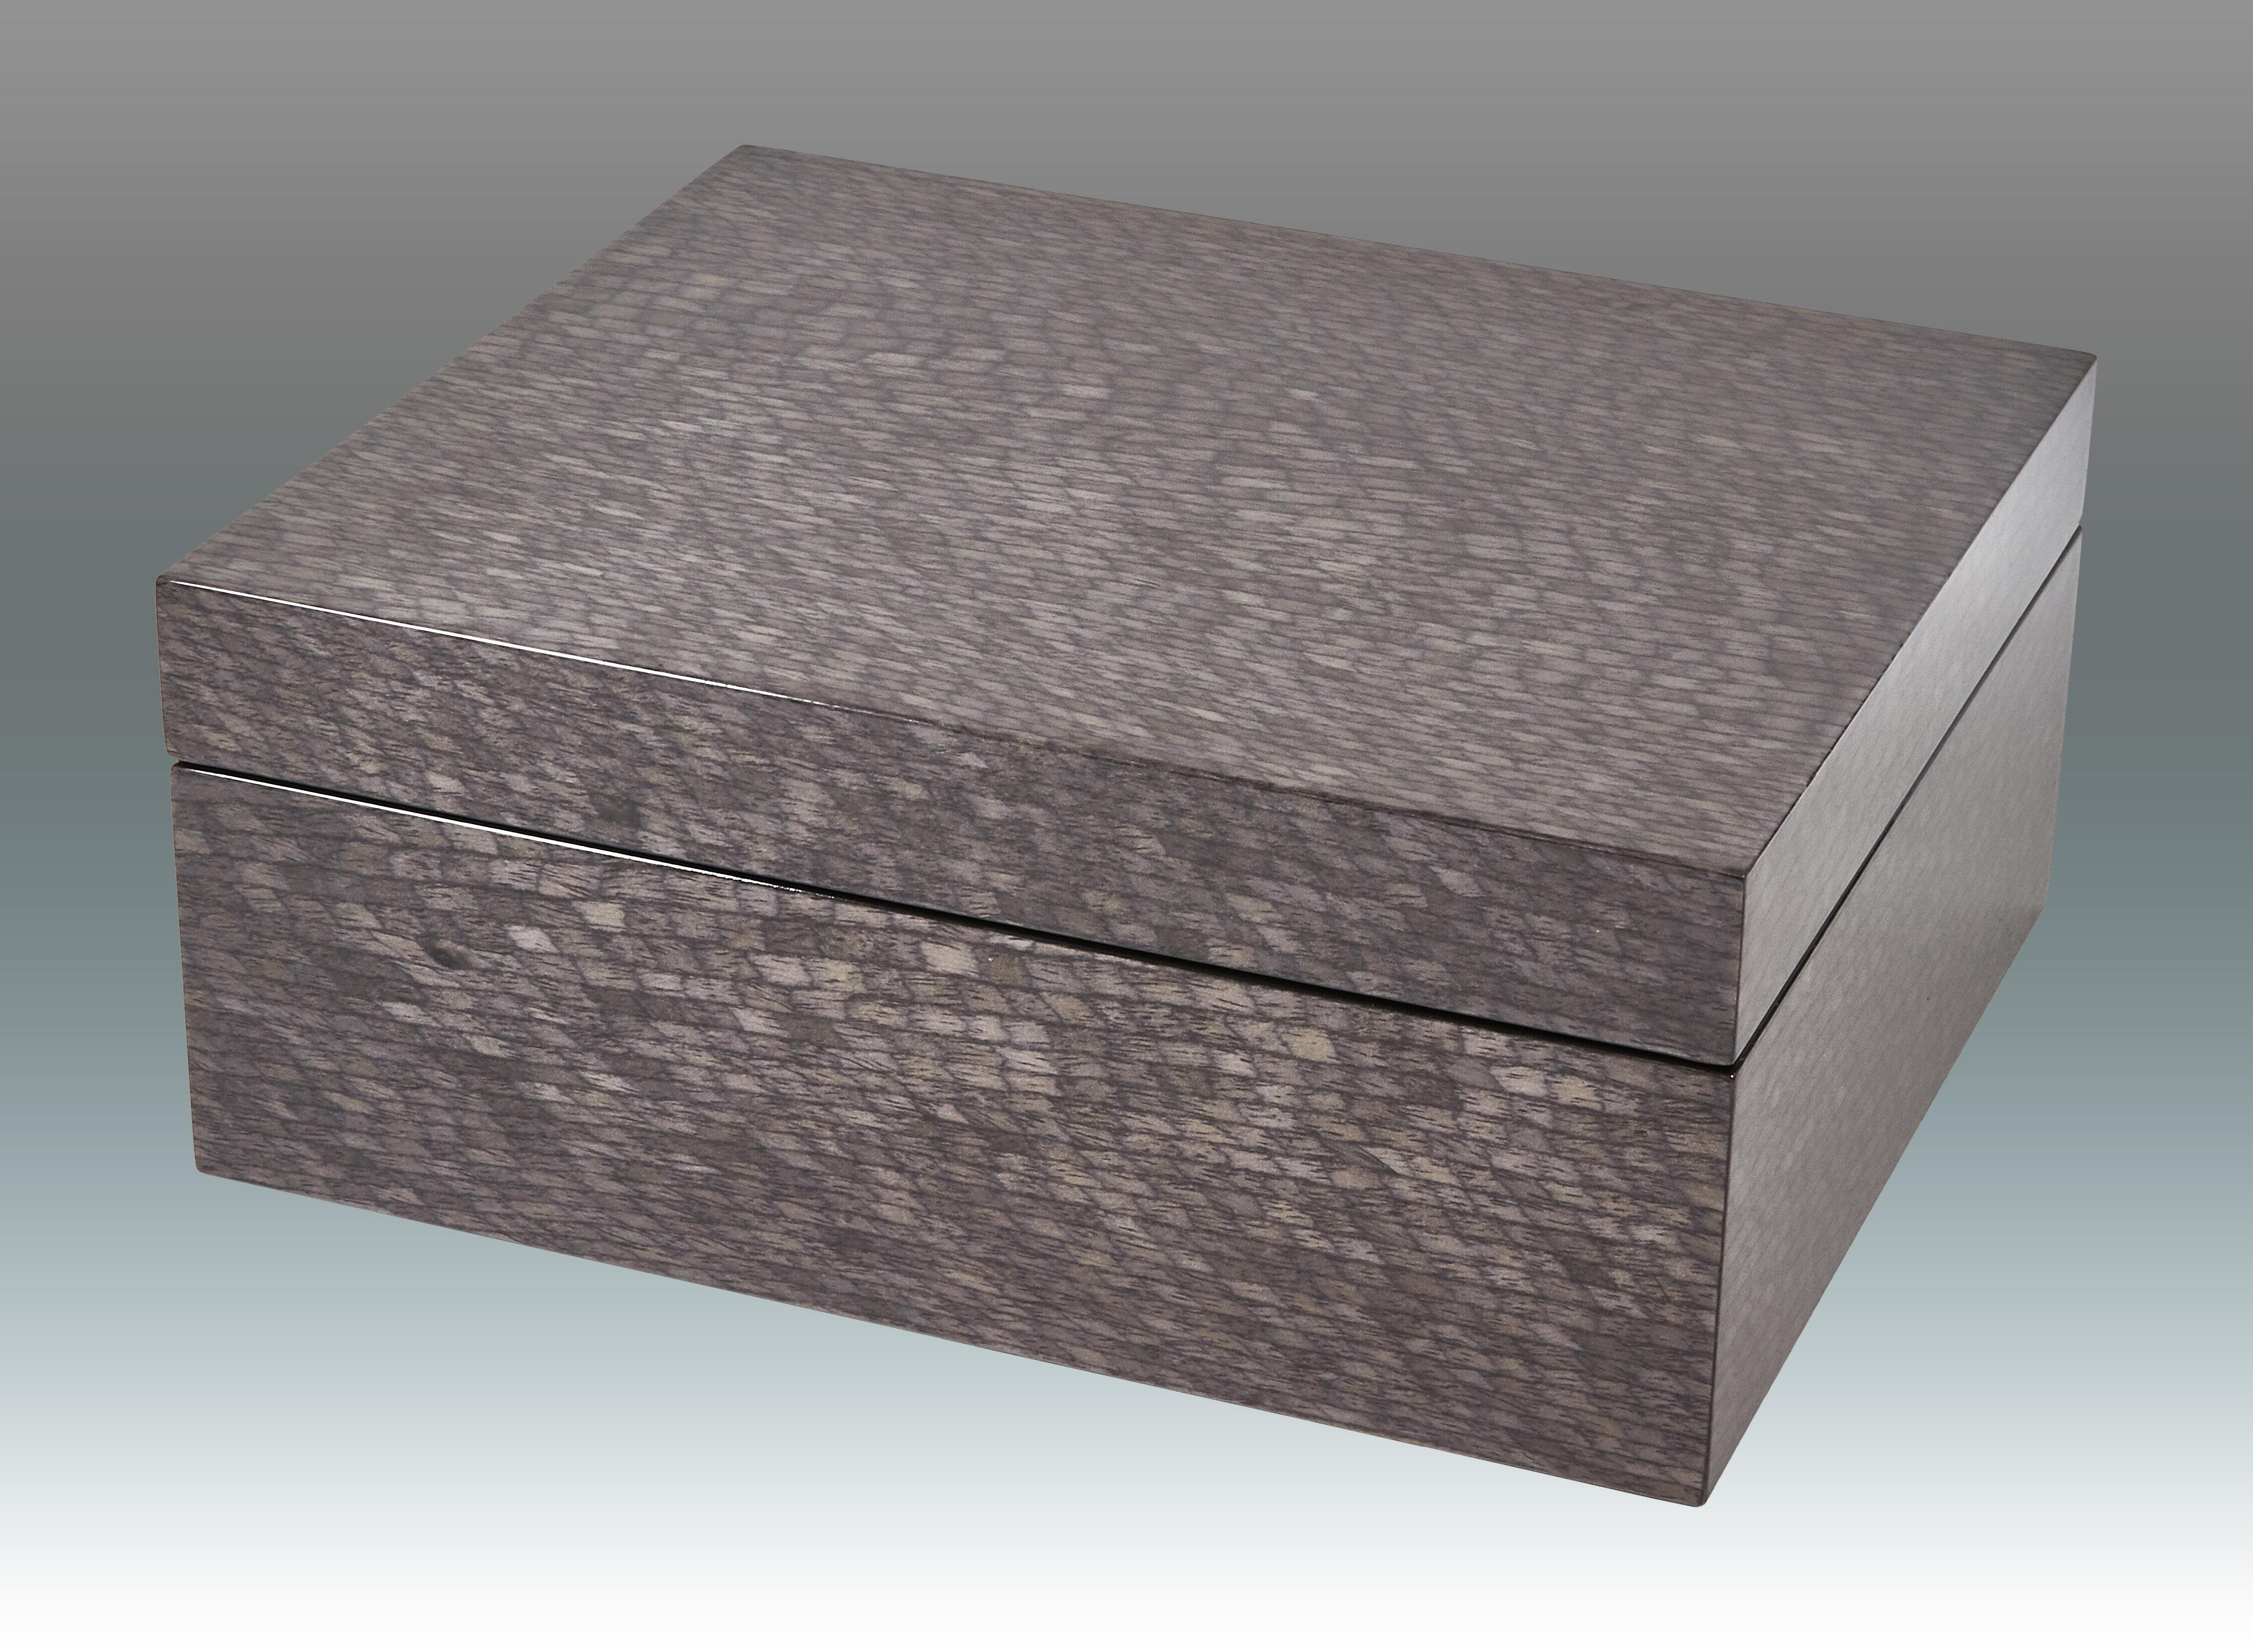 Tizo Fishscale Empty Wood Decorative Box Wayfair